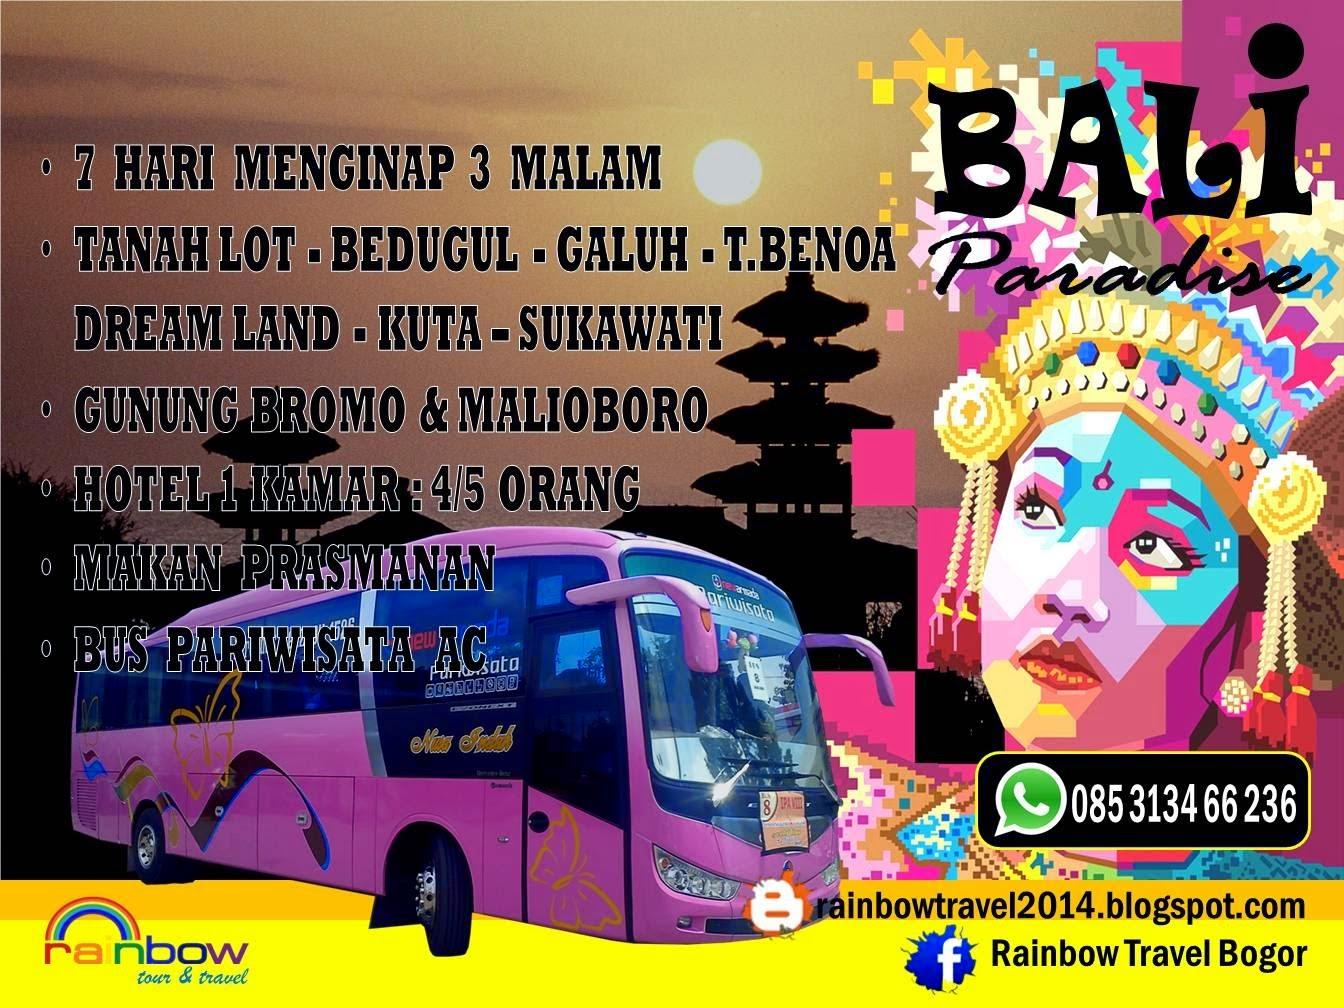 Derainbow Tour Organizer Rent A Bus Paket Wisata Murah Meriah